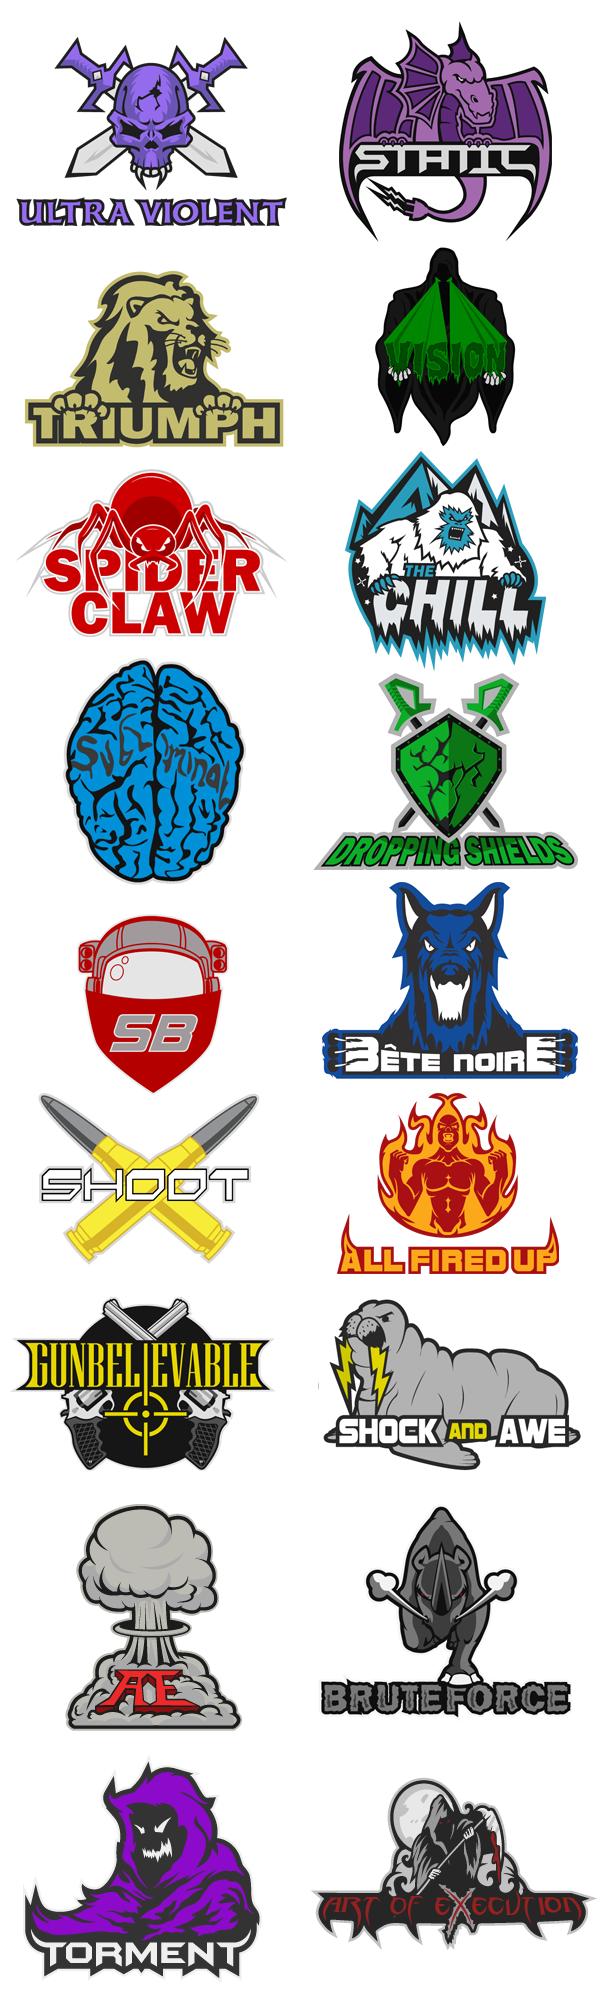 Mlg Cod Team Logos Mlg Cod Team Logos Team Logo